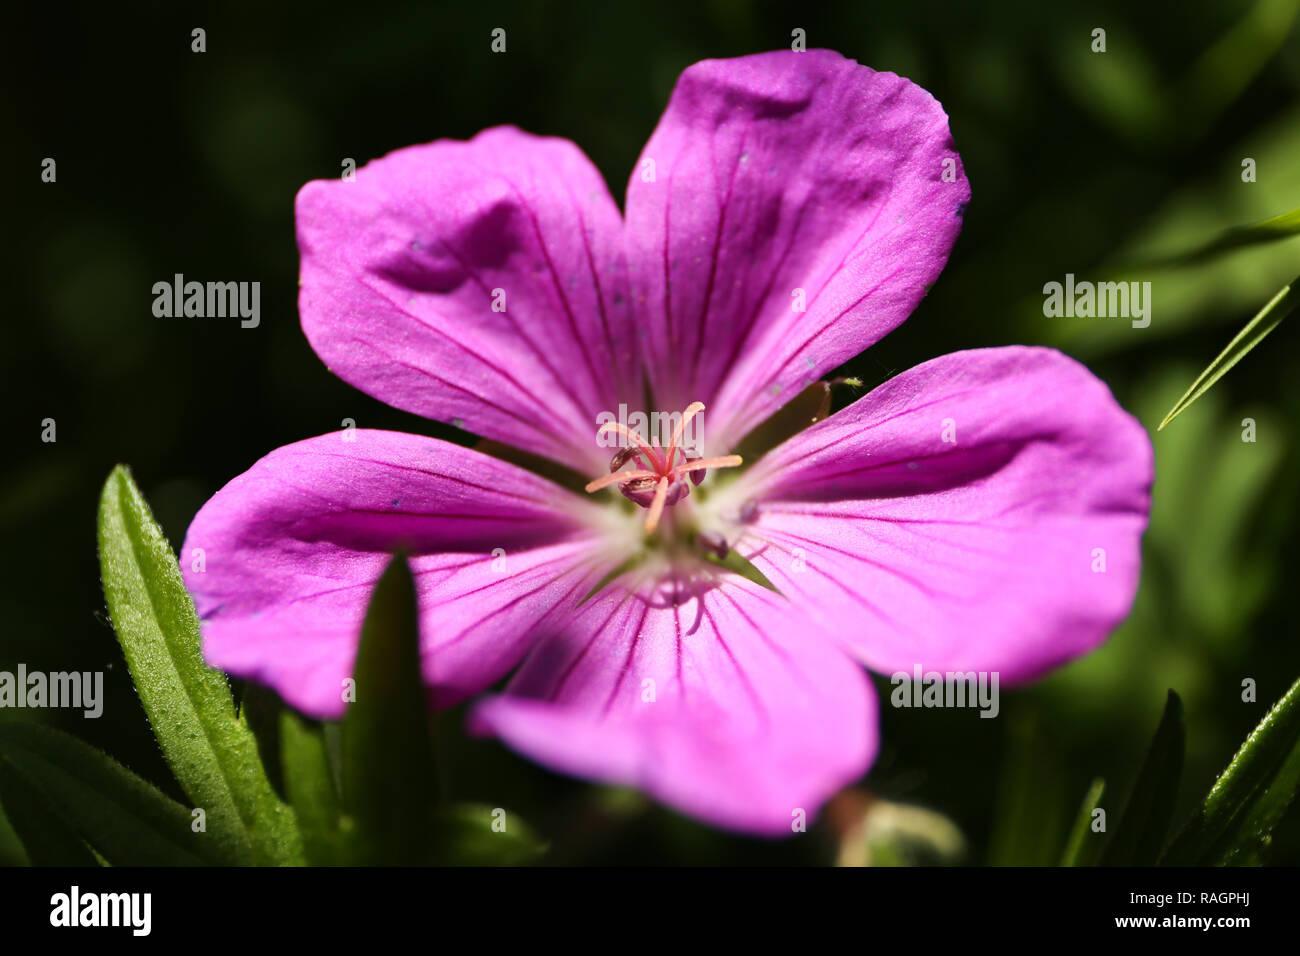 Wonderful single purple geranium blossom - Stock Image